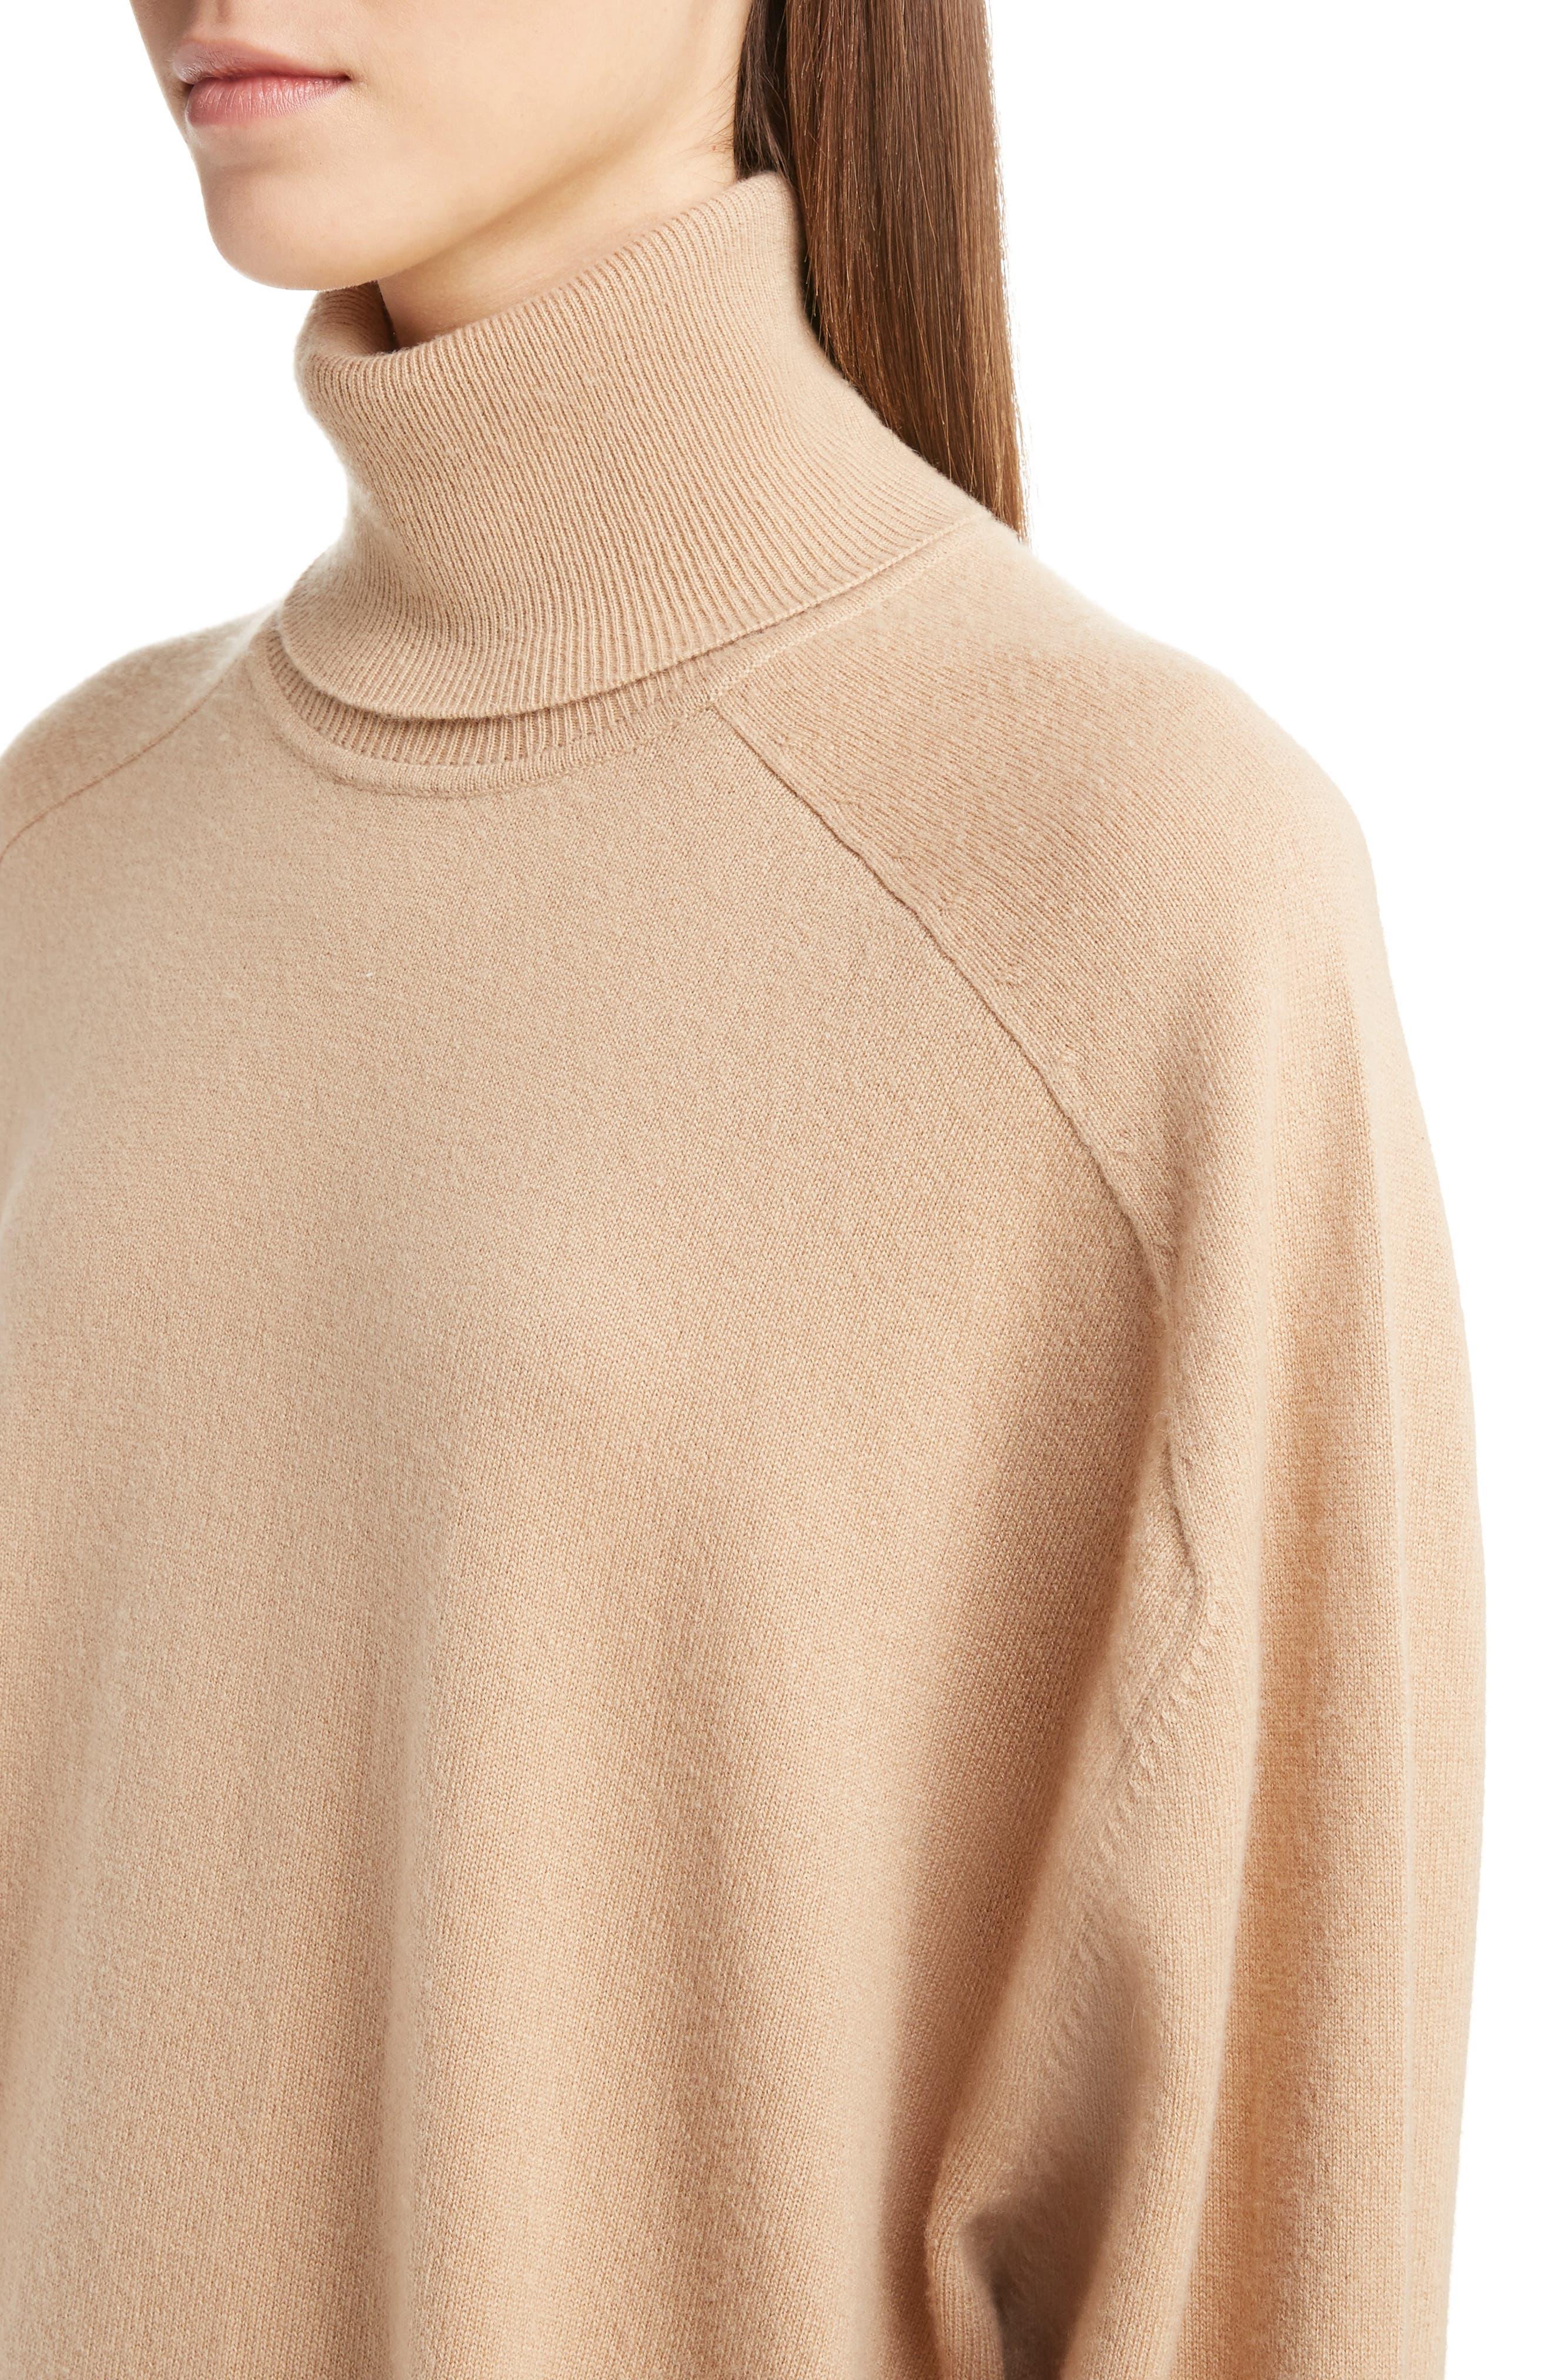 Oversized Cashmere Turtleneck Sweater,                             Alternate thumbnail 4, color,                             250